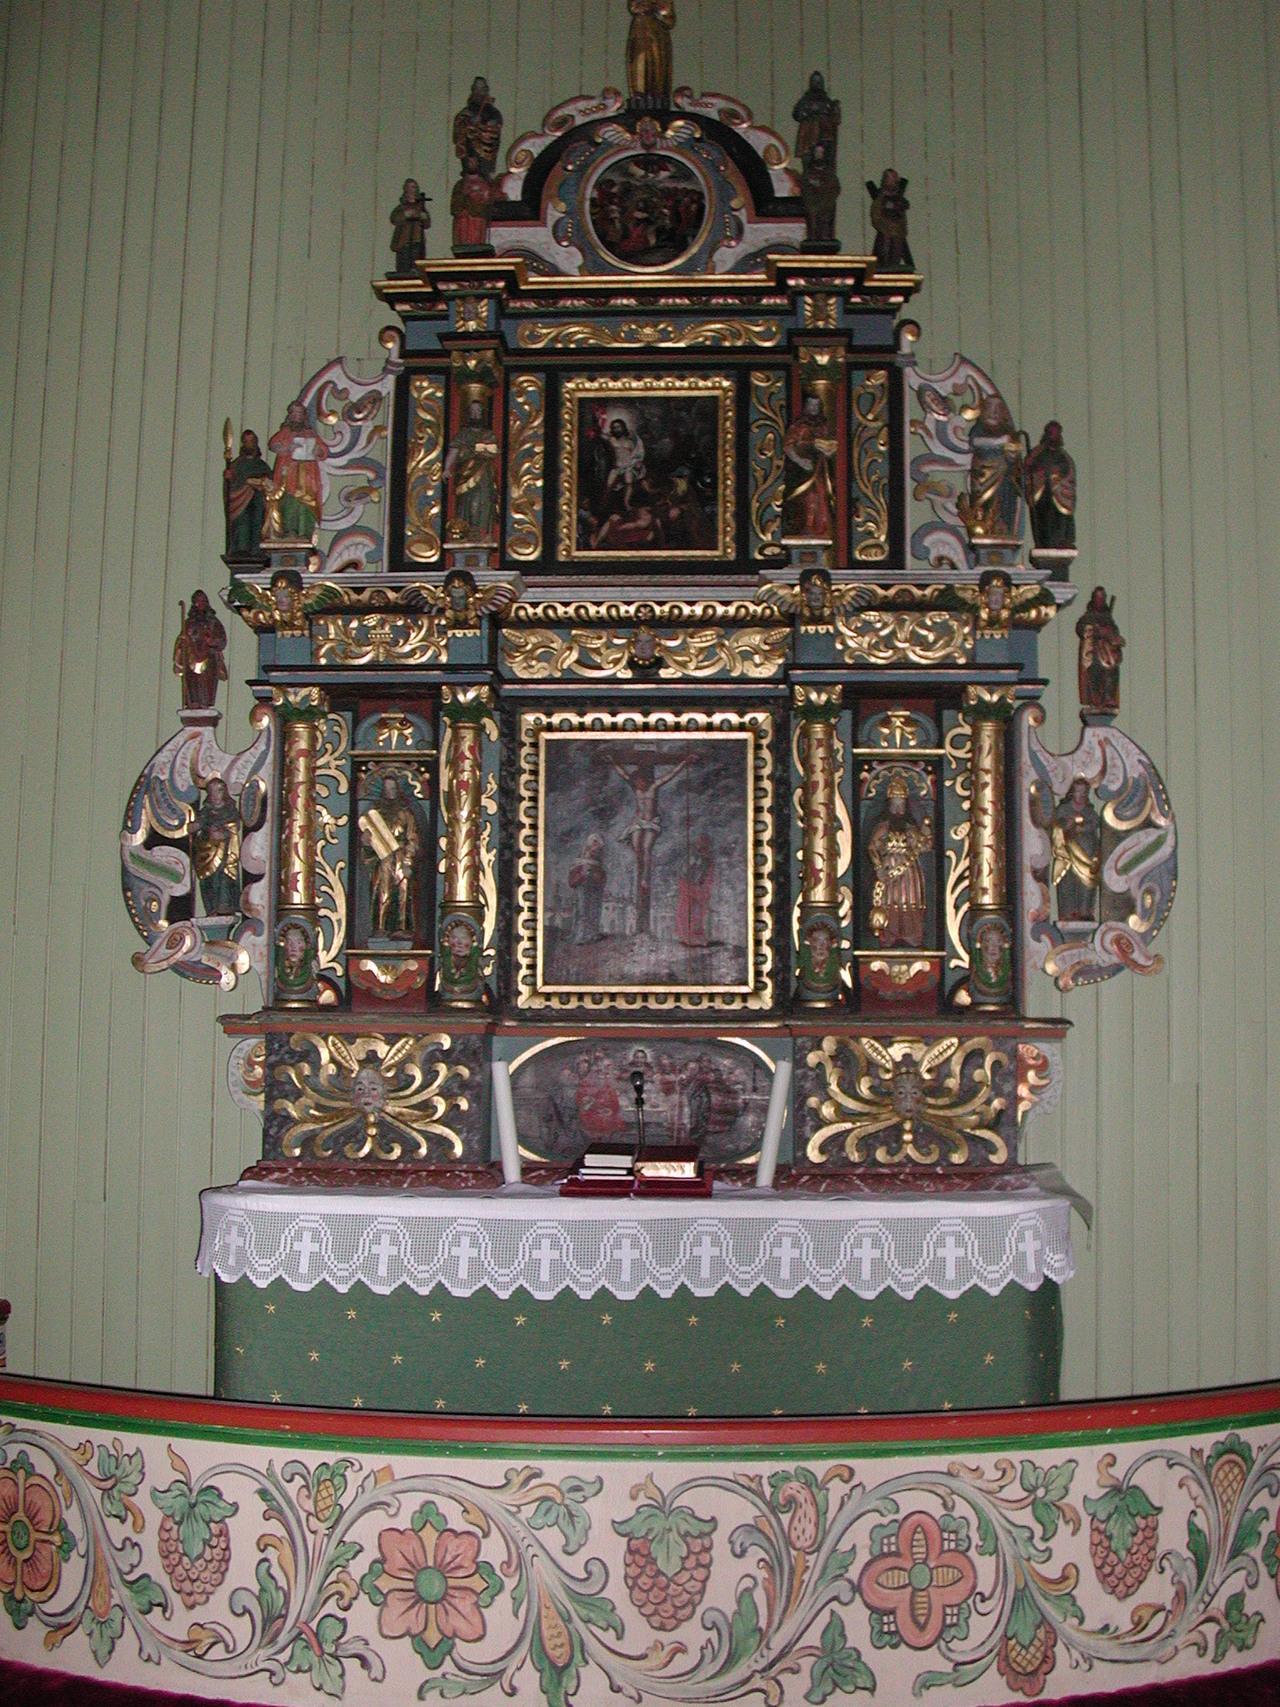 https://folldal.kirken.no/img/11_07_07_Folldal_Kyrkje/Folldal,alter.JPG